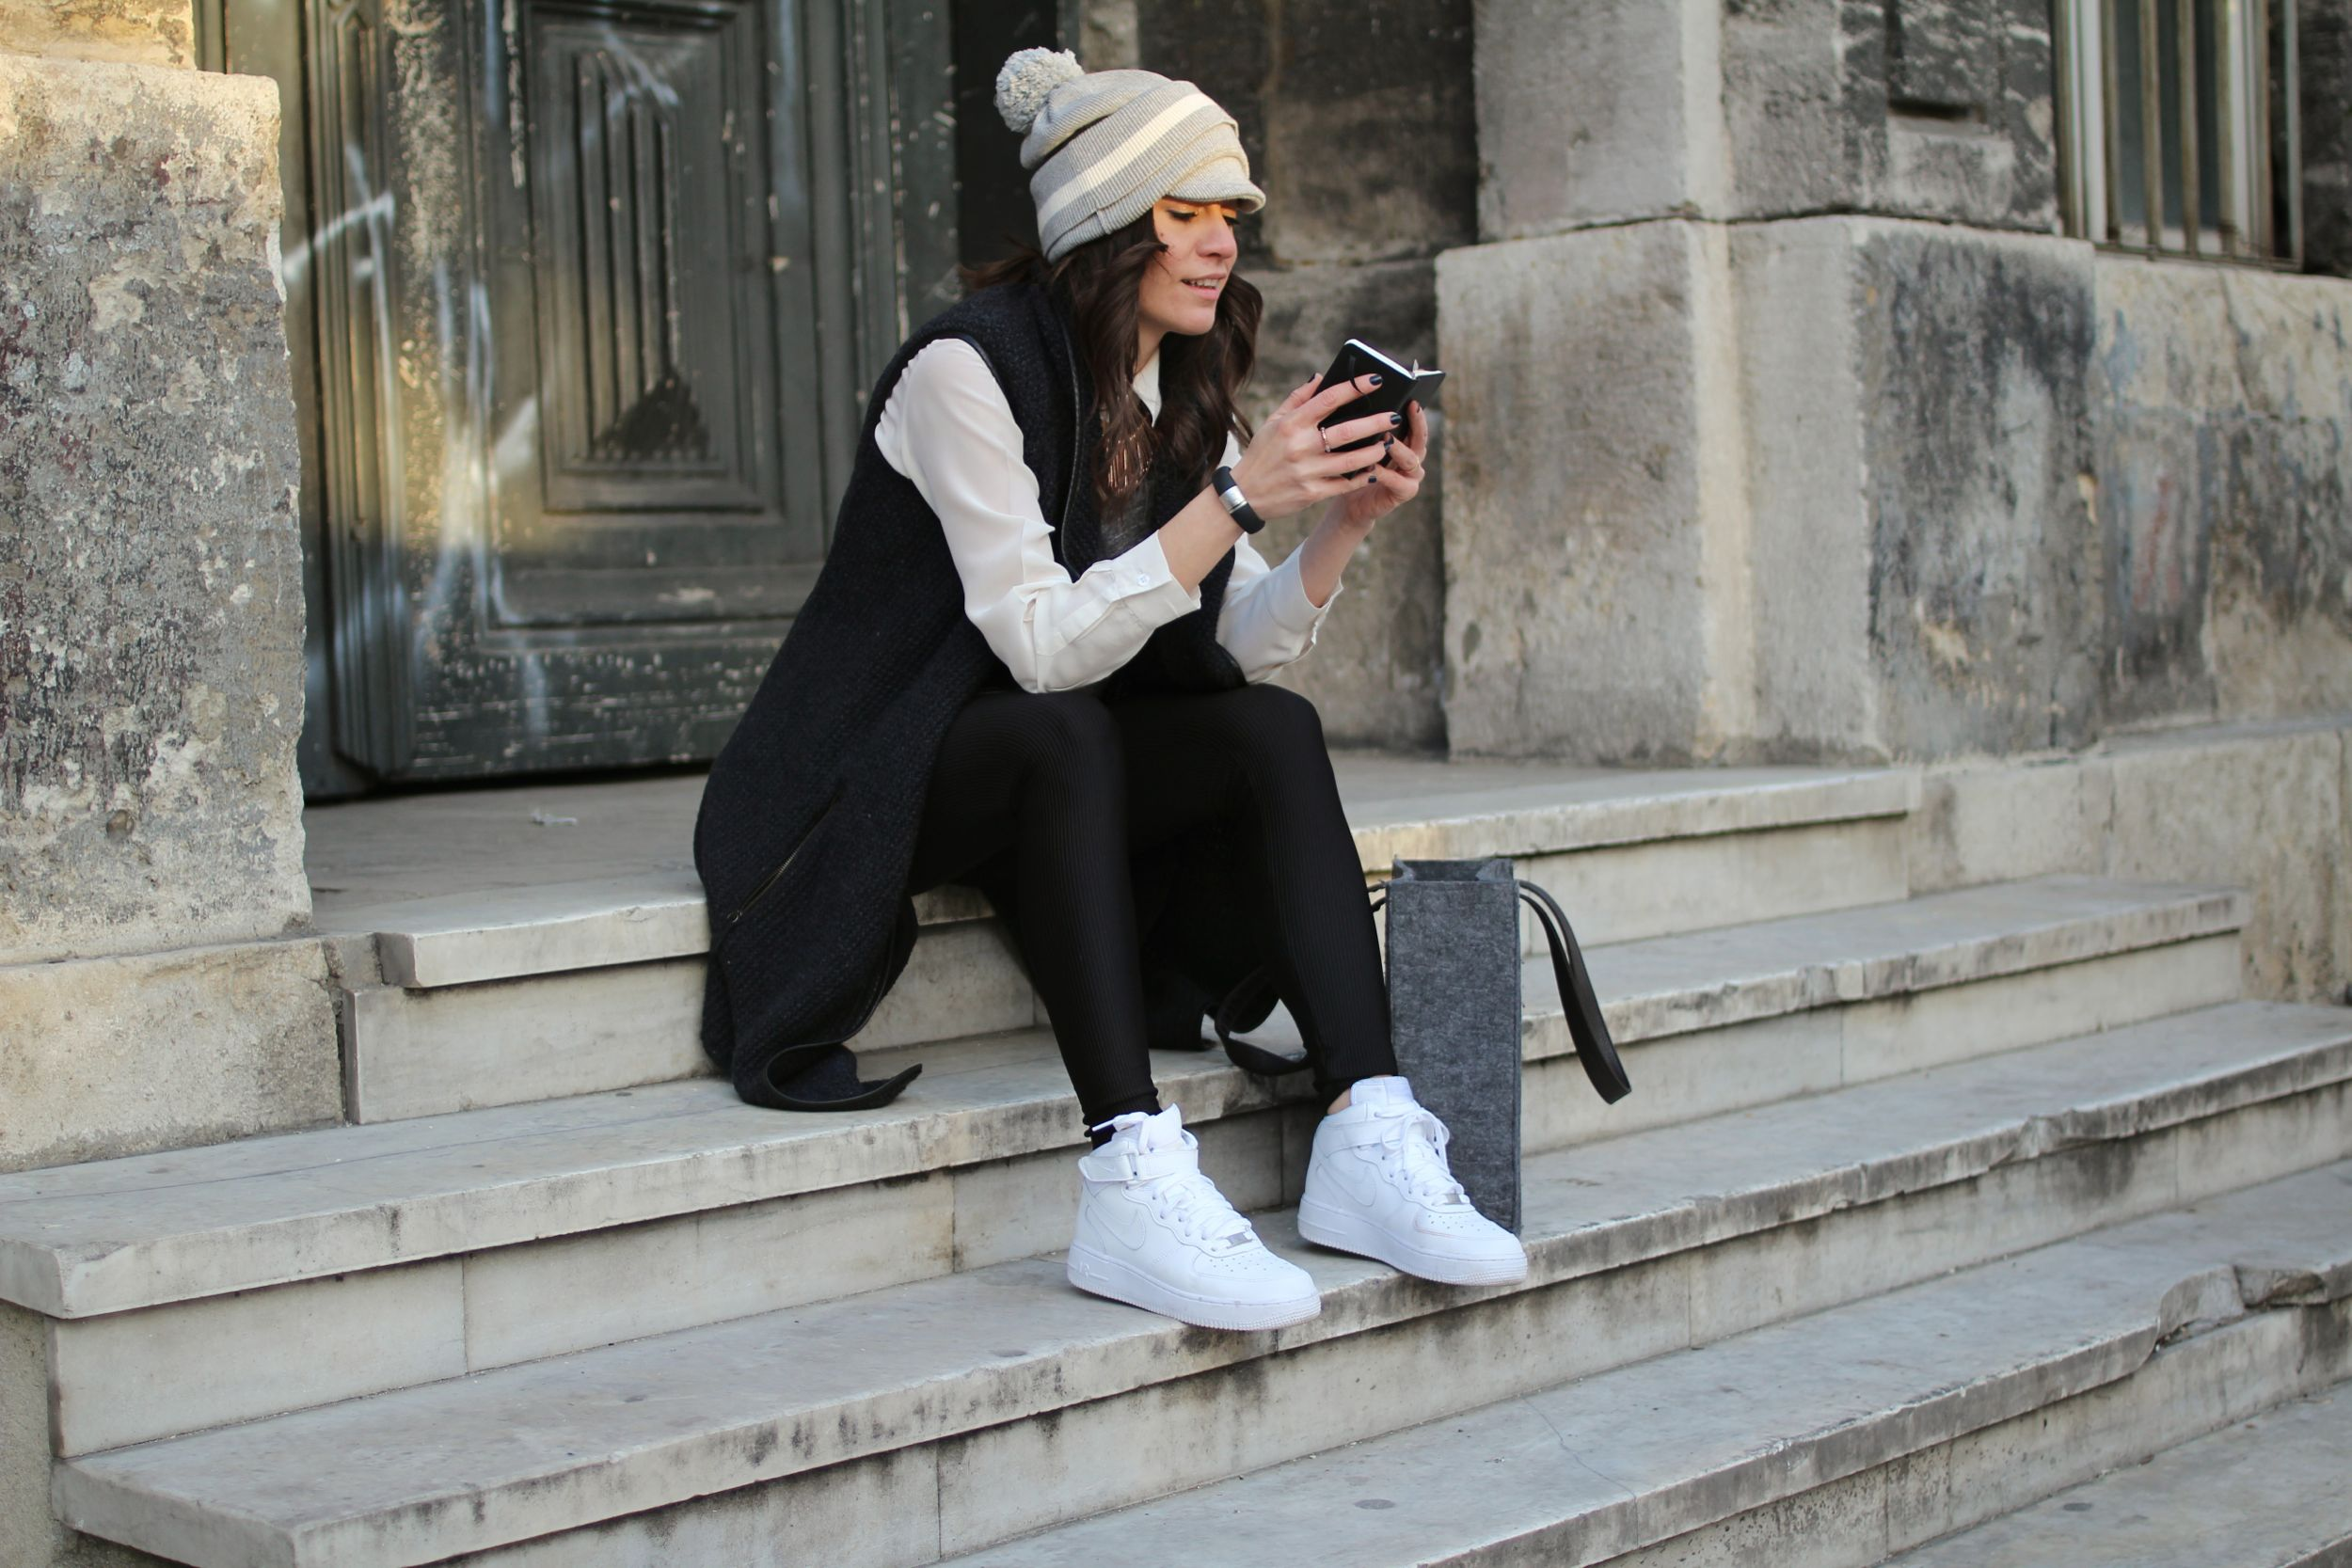 off ne giysem, billur saatci, blogger, turkish blogger, street style, nike, airforce, nike air force, vsp, vsp paris, beymen, marc jacobs, zara man, derishow, iro,